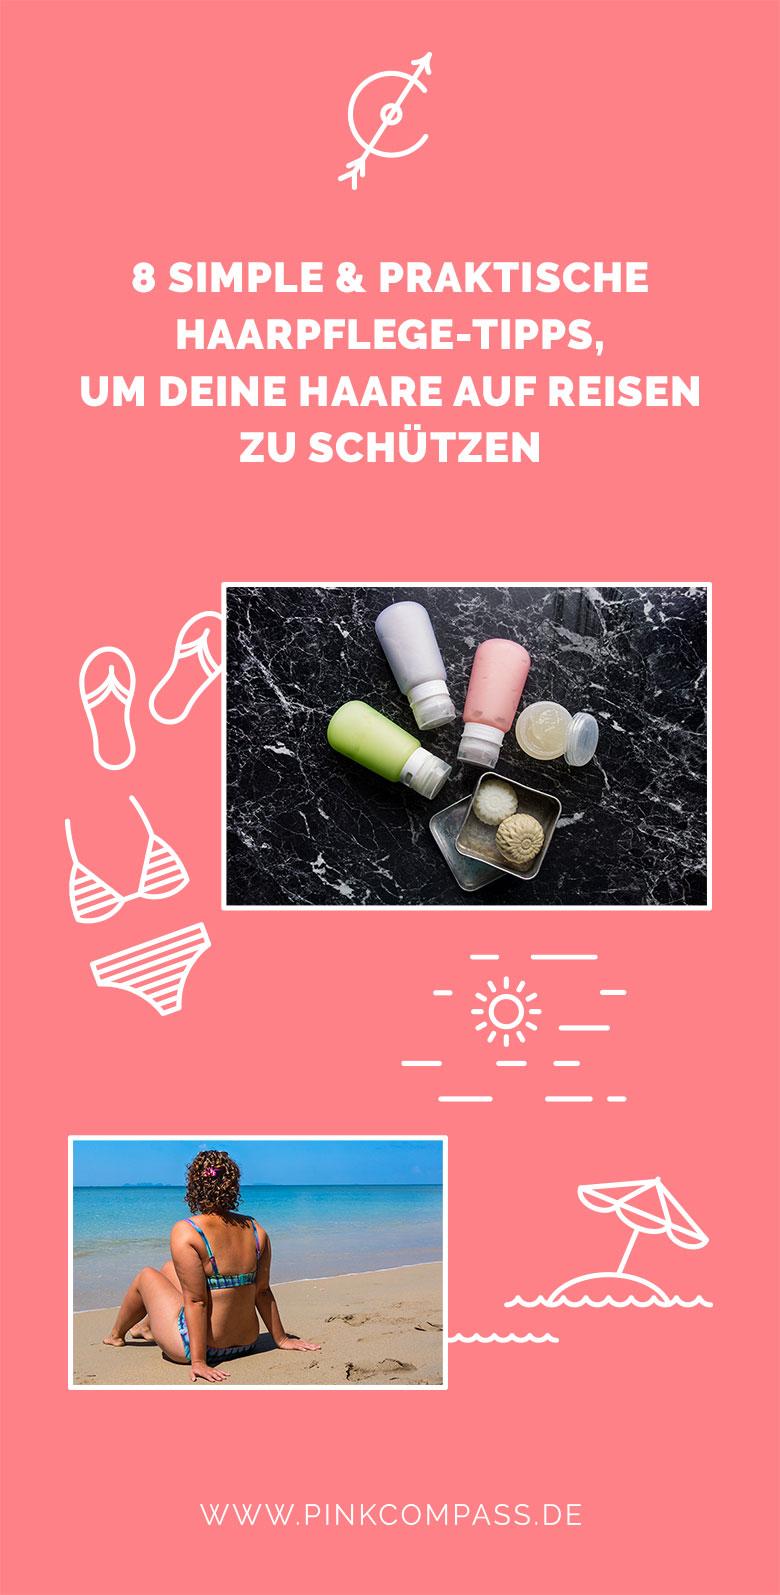 Pink-Compass-Haarpflege-Tipps-Reisen